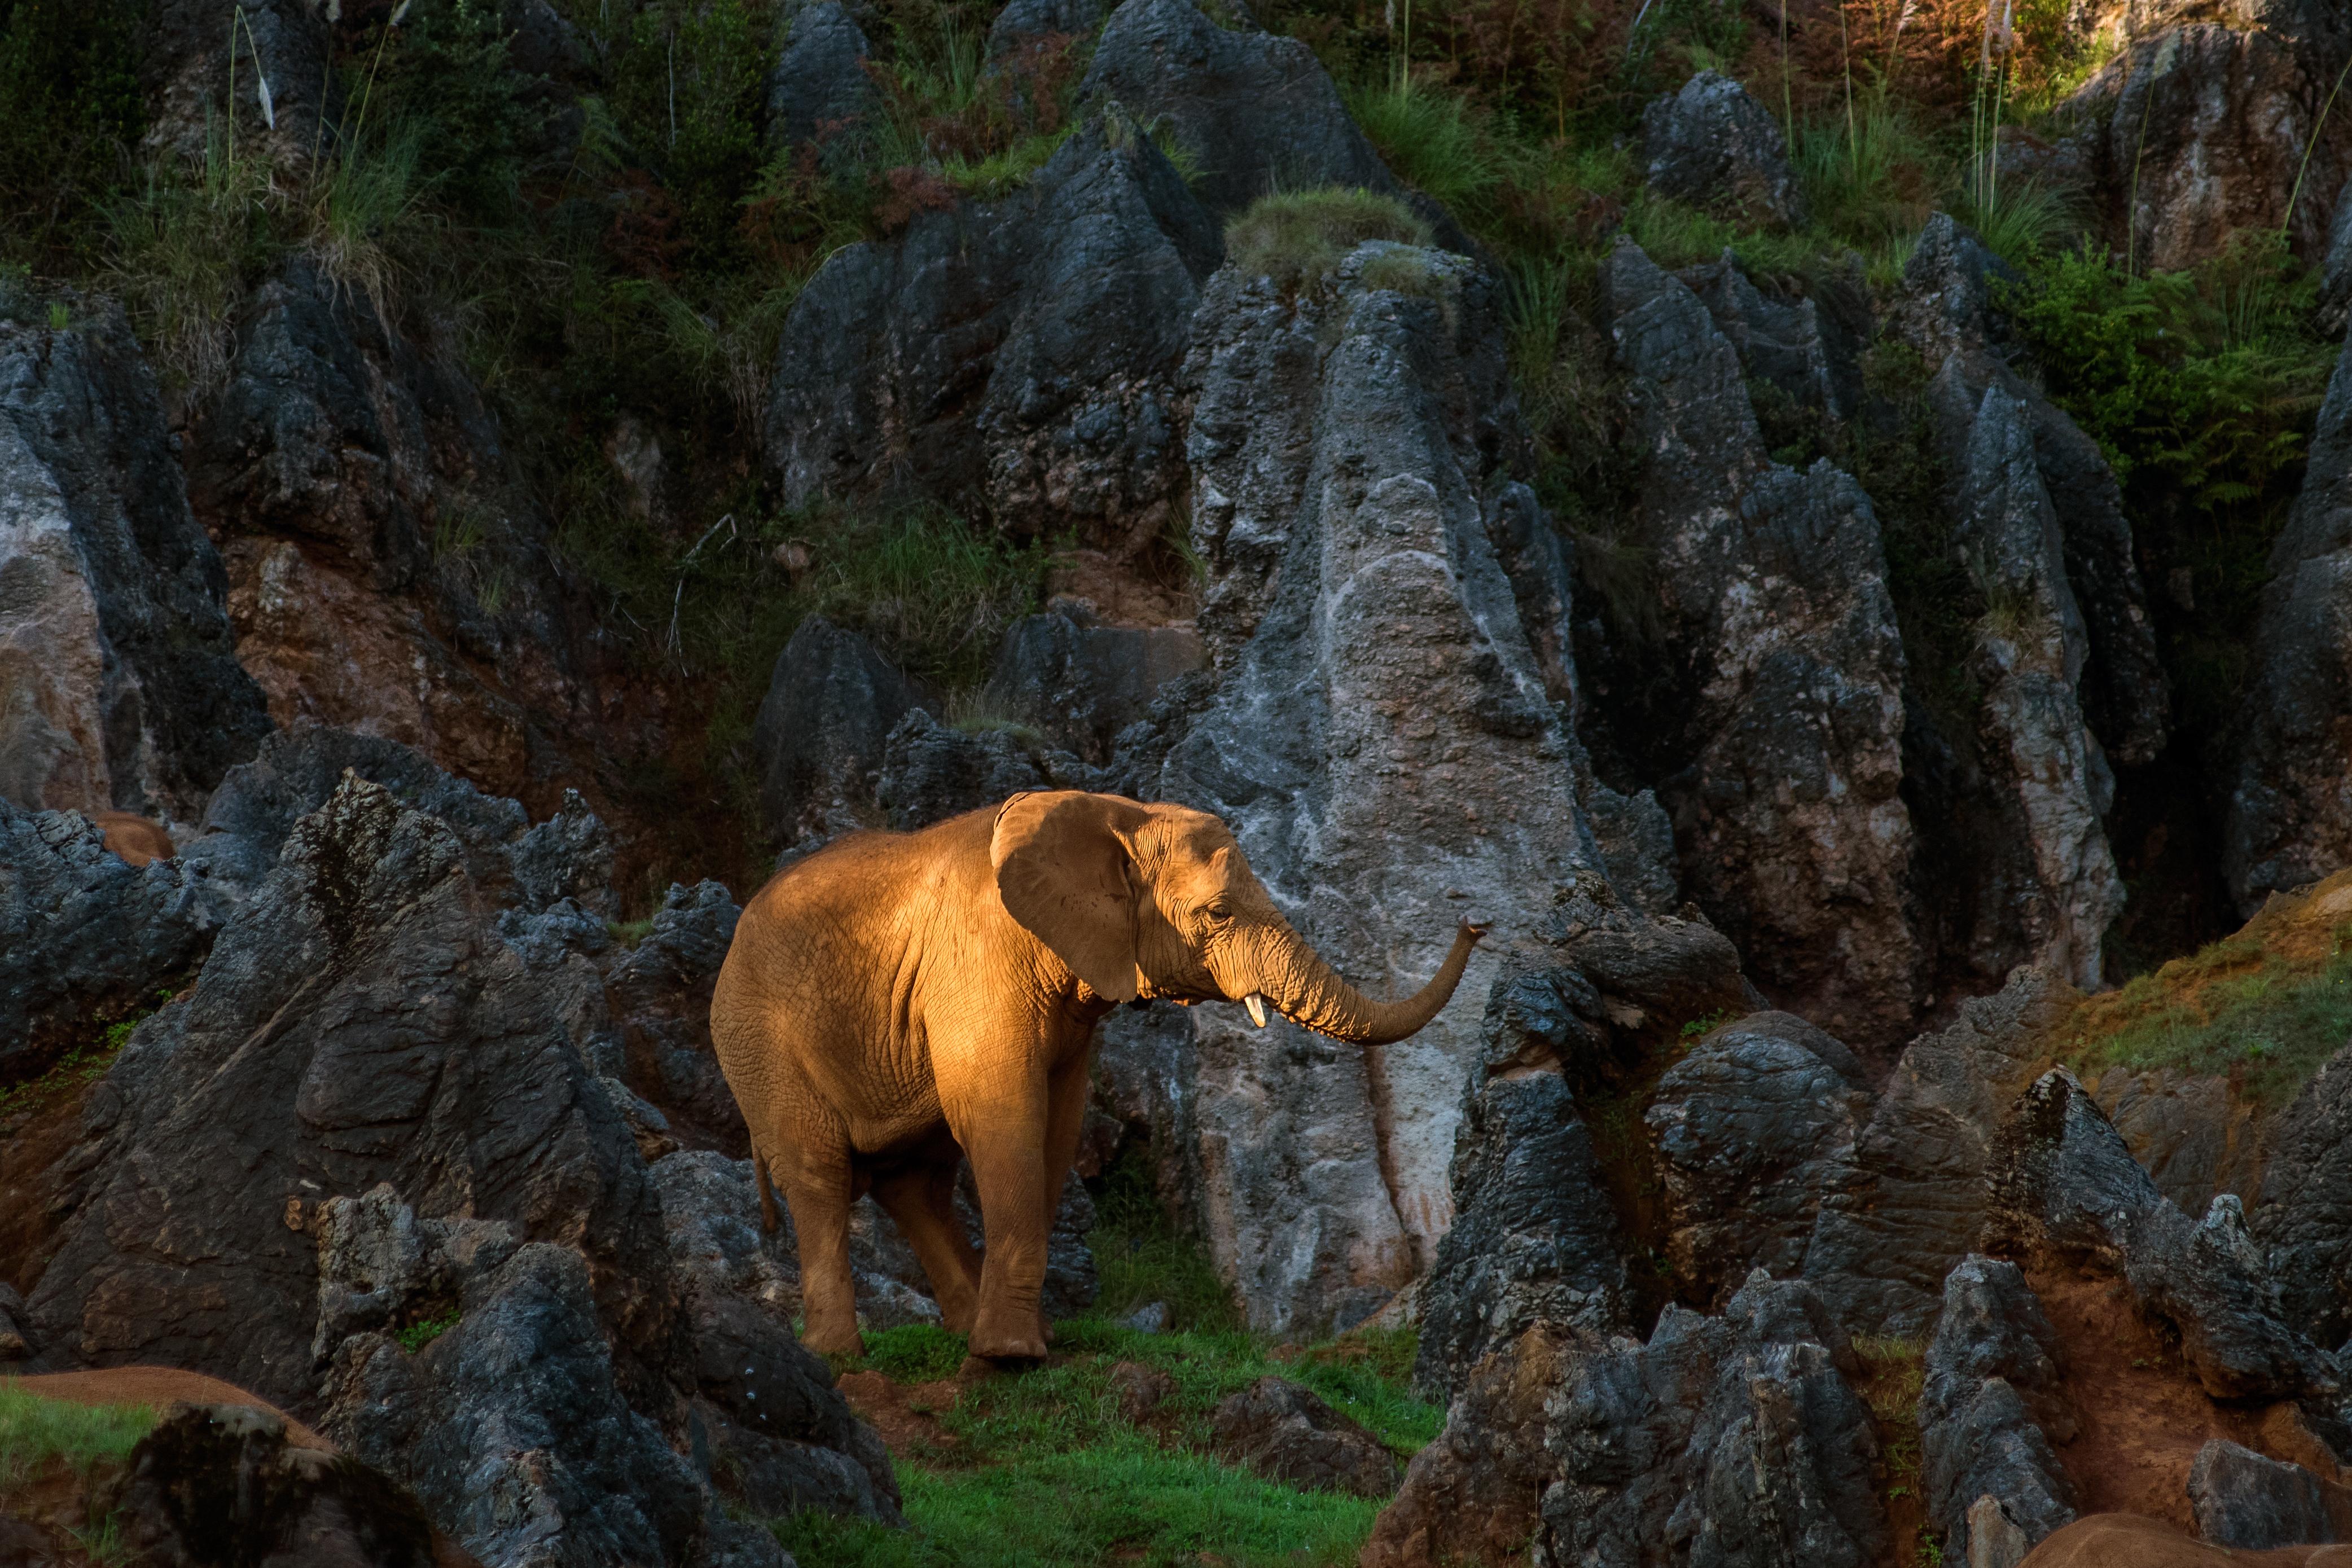 washingtonpost.com - David Kohn - Rarity of cancer in elephants may help explain cancer in humans